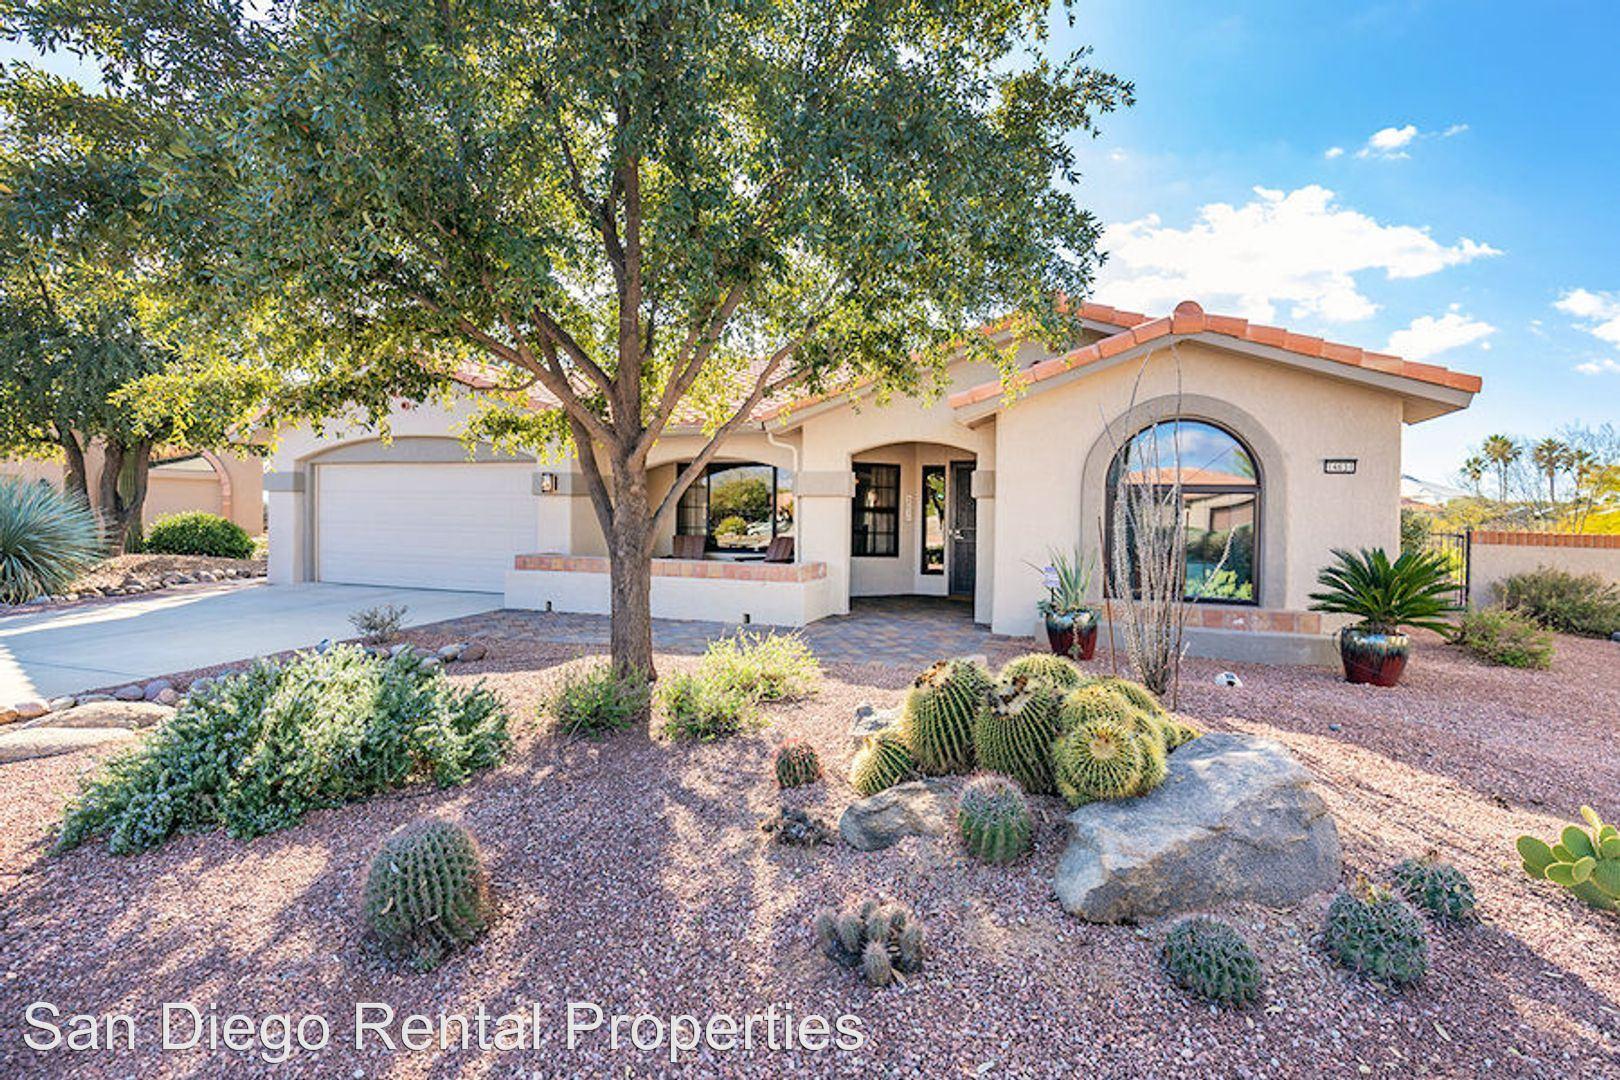 14631 N. Flagstone Dr., Oro Valley, AZ - $3,500